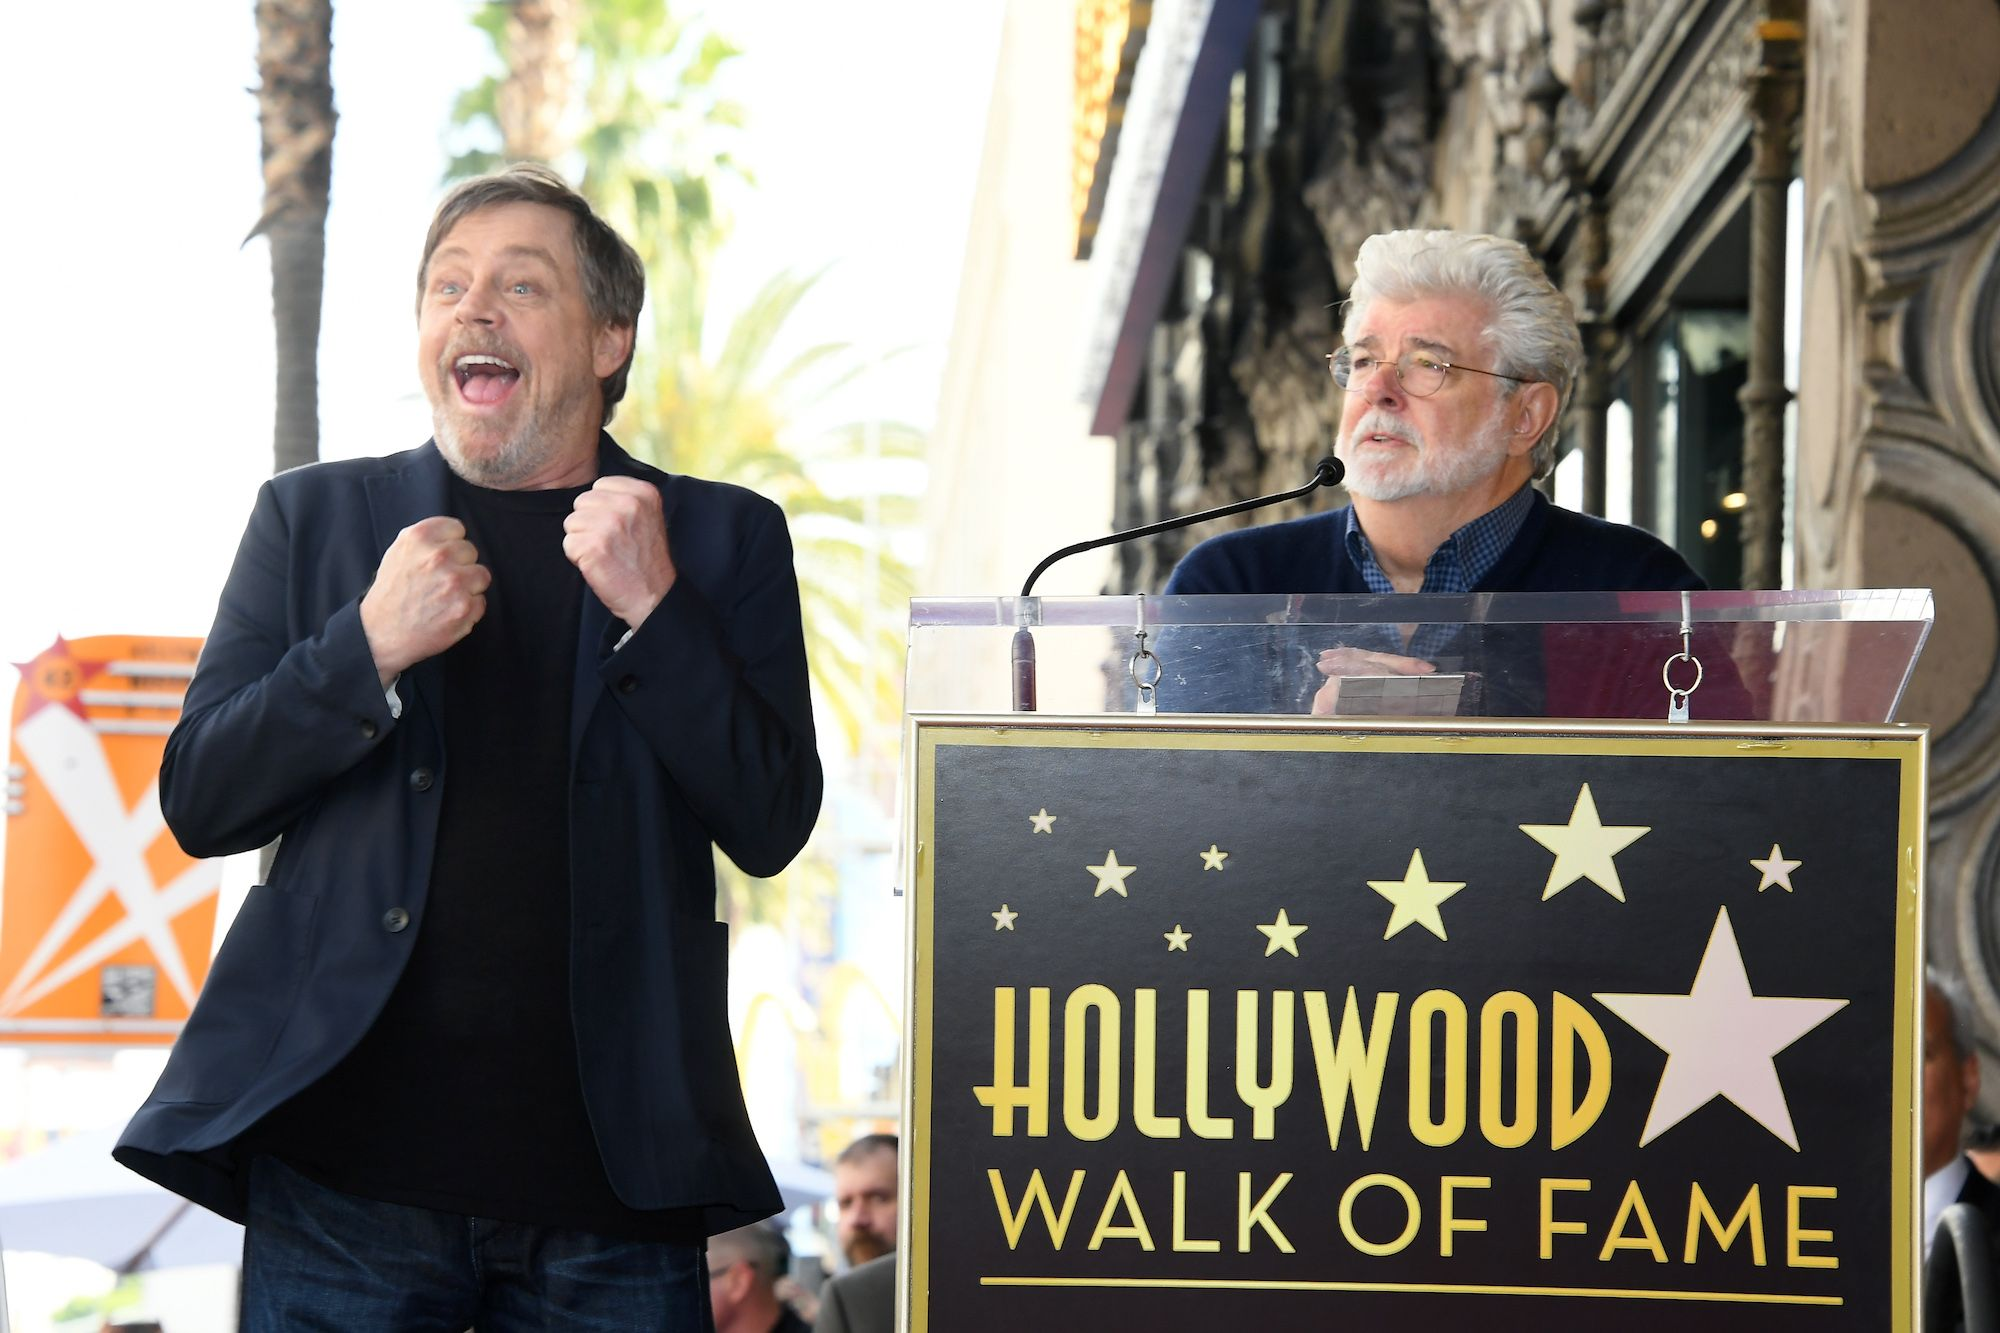 Star Wars Mark Hamill Trolea a George Lucas - Meme Leia